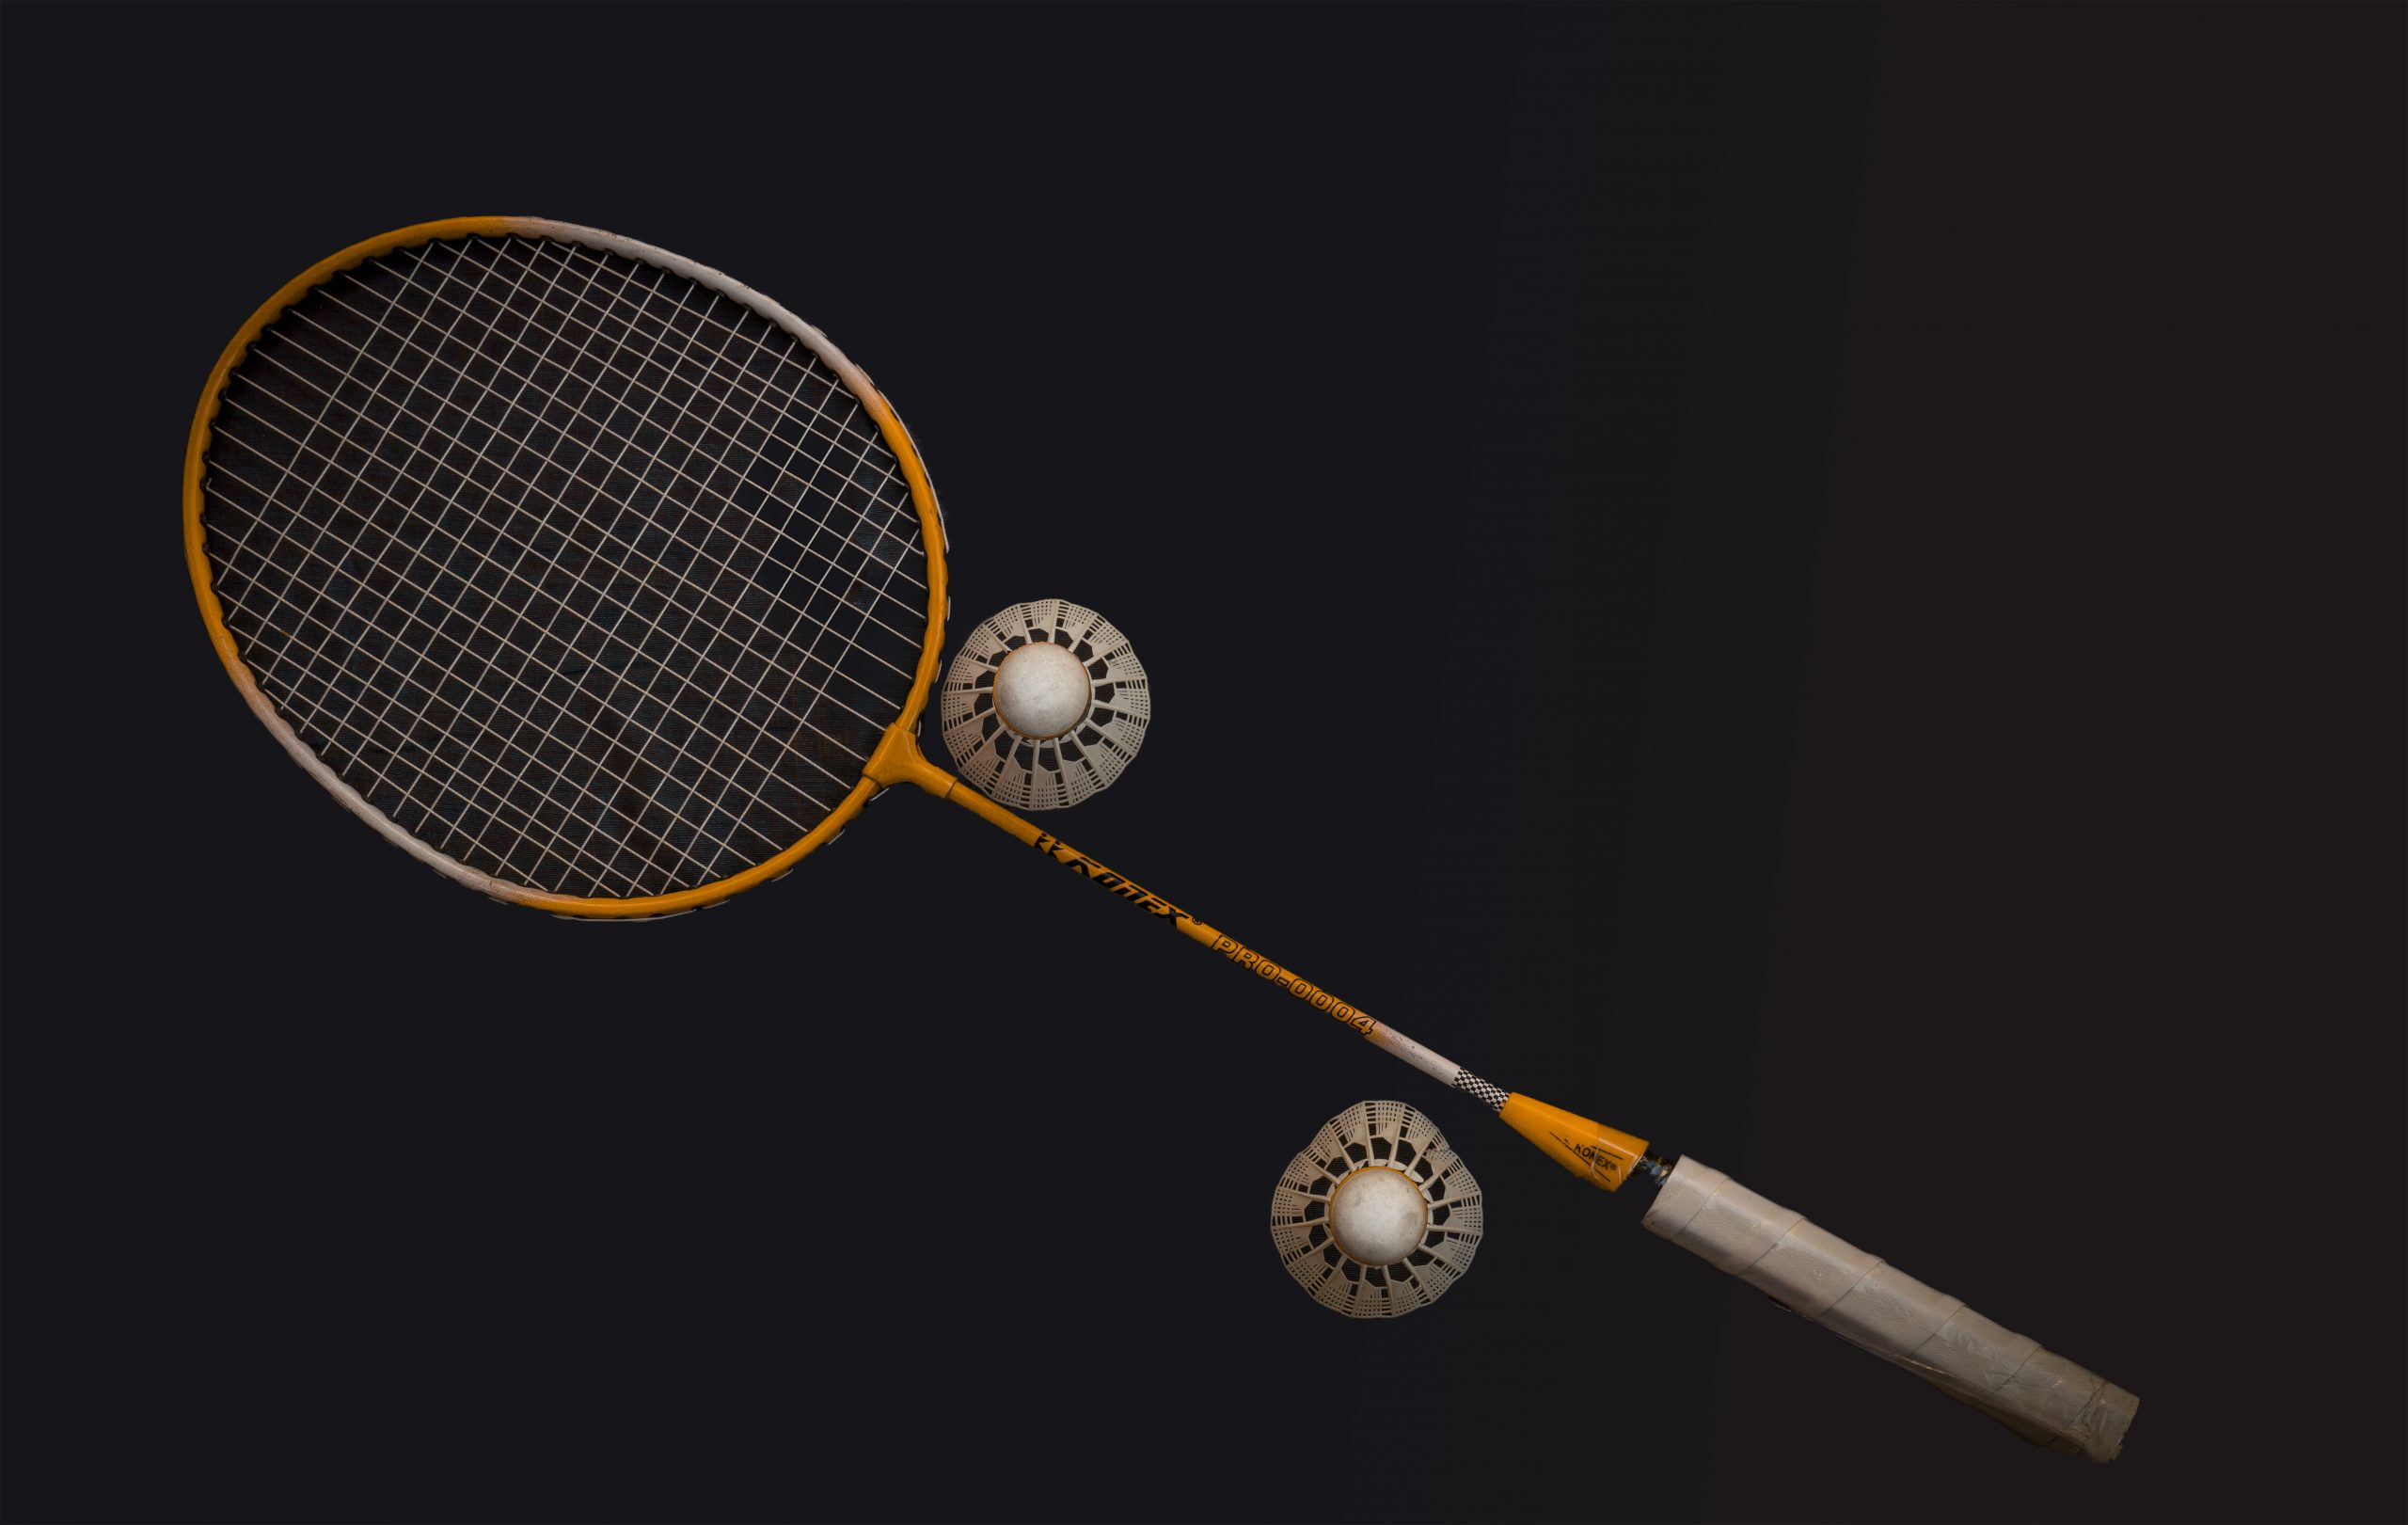 Badminton and shuttlecocks